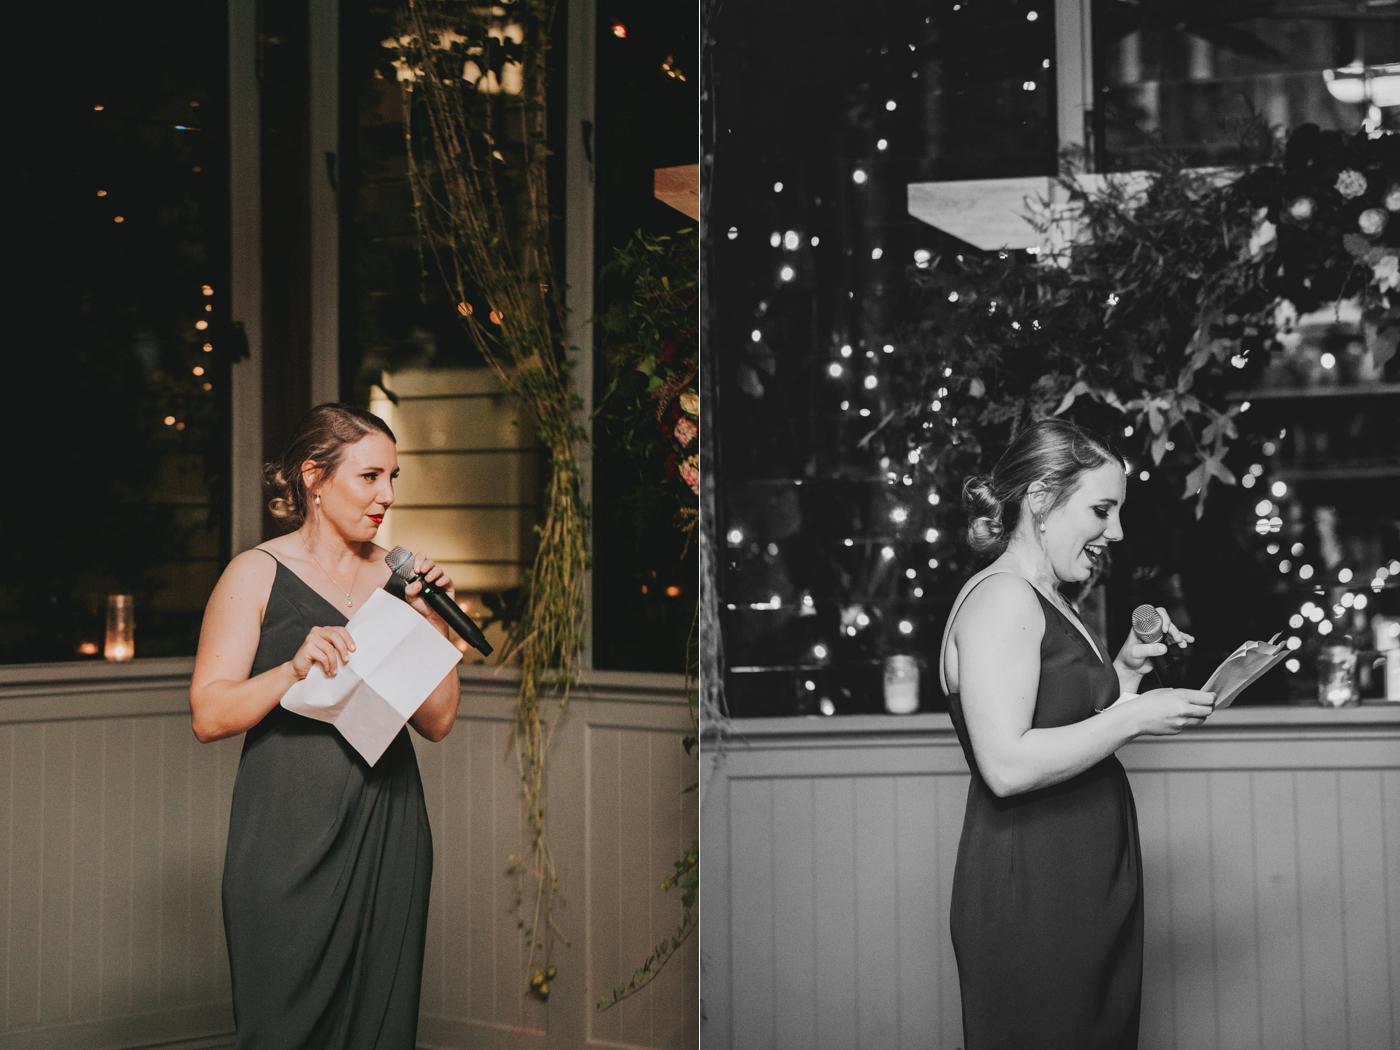 Jo & Tom Wedding - The Grounds of Alexandria - Samantha Heather Photography-294.jpg